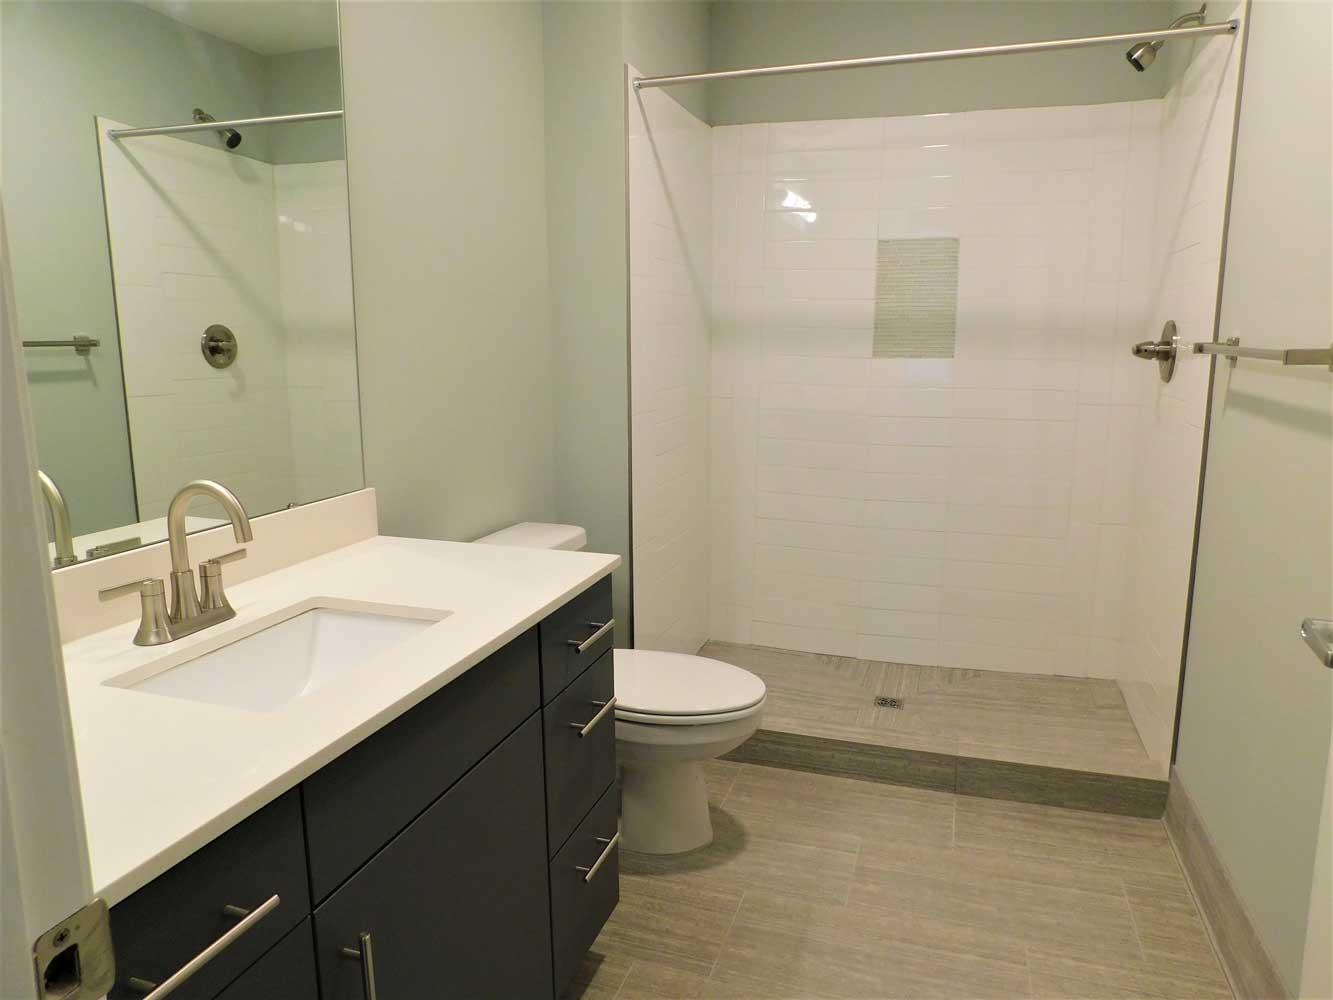 Shower at Midtown Plaza Apartments in Kansas City, MO